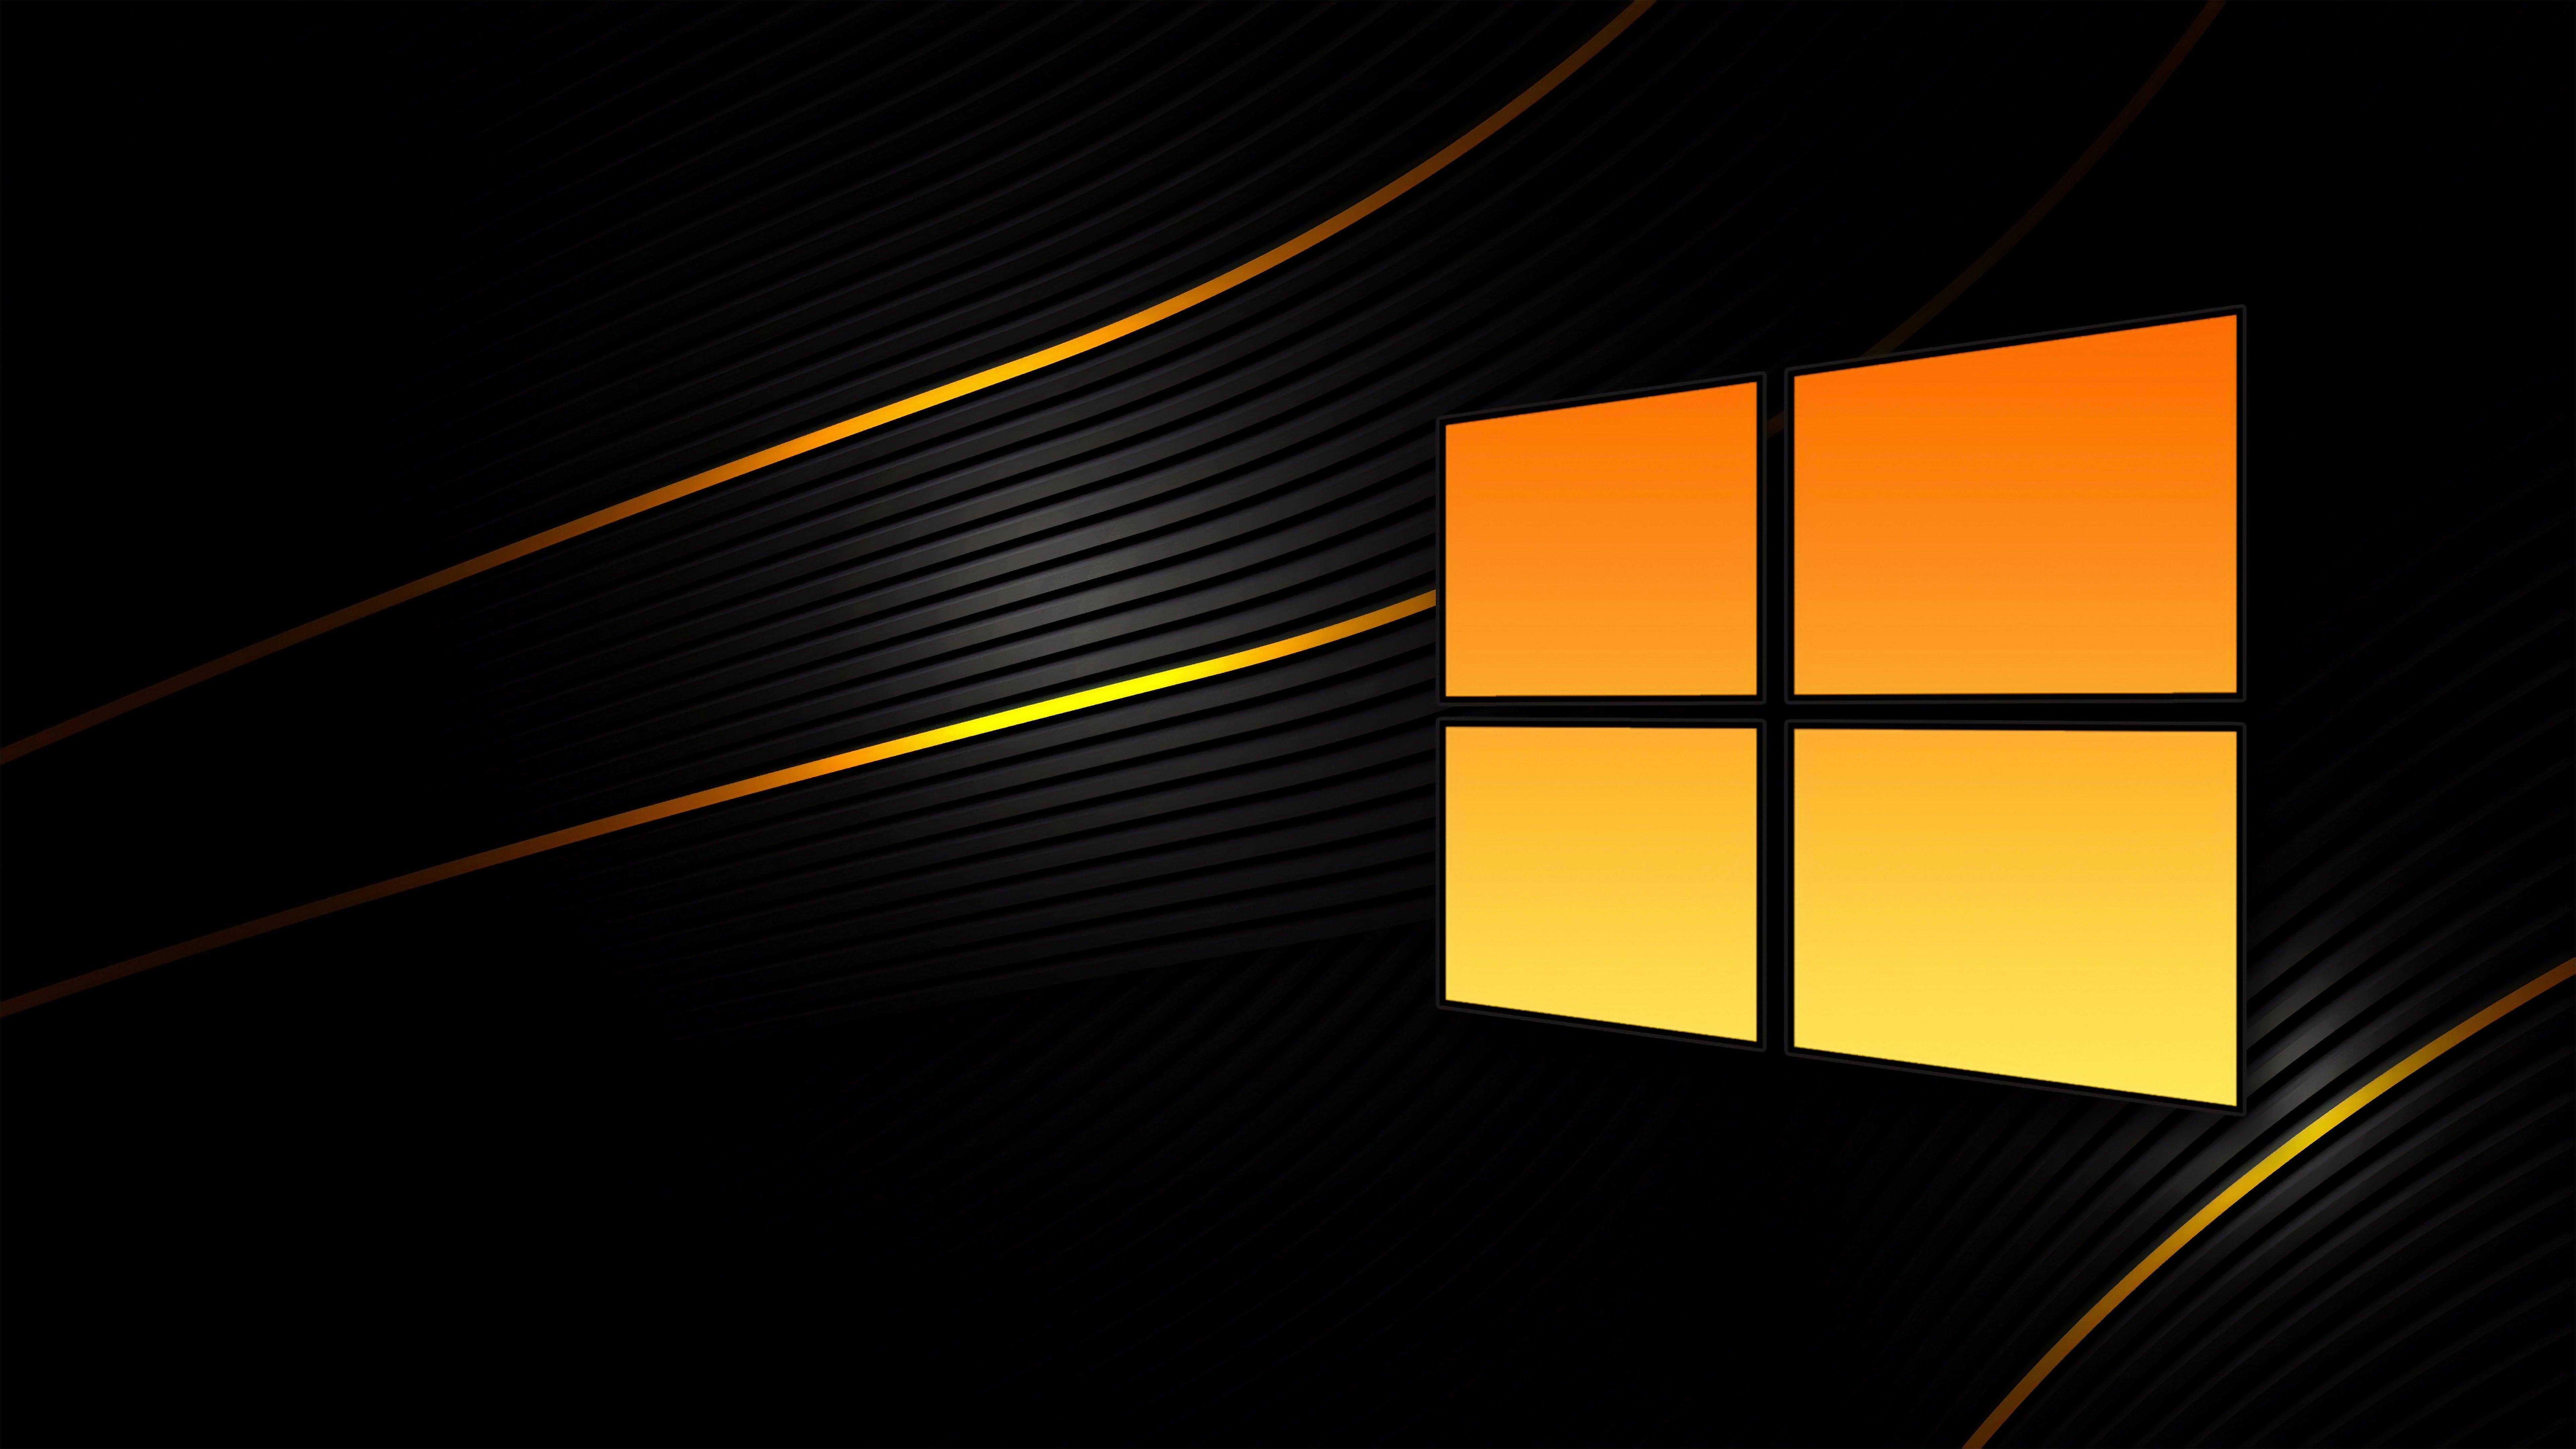 Fondos de pantalla Windows 10 Negro